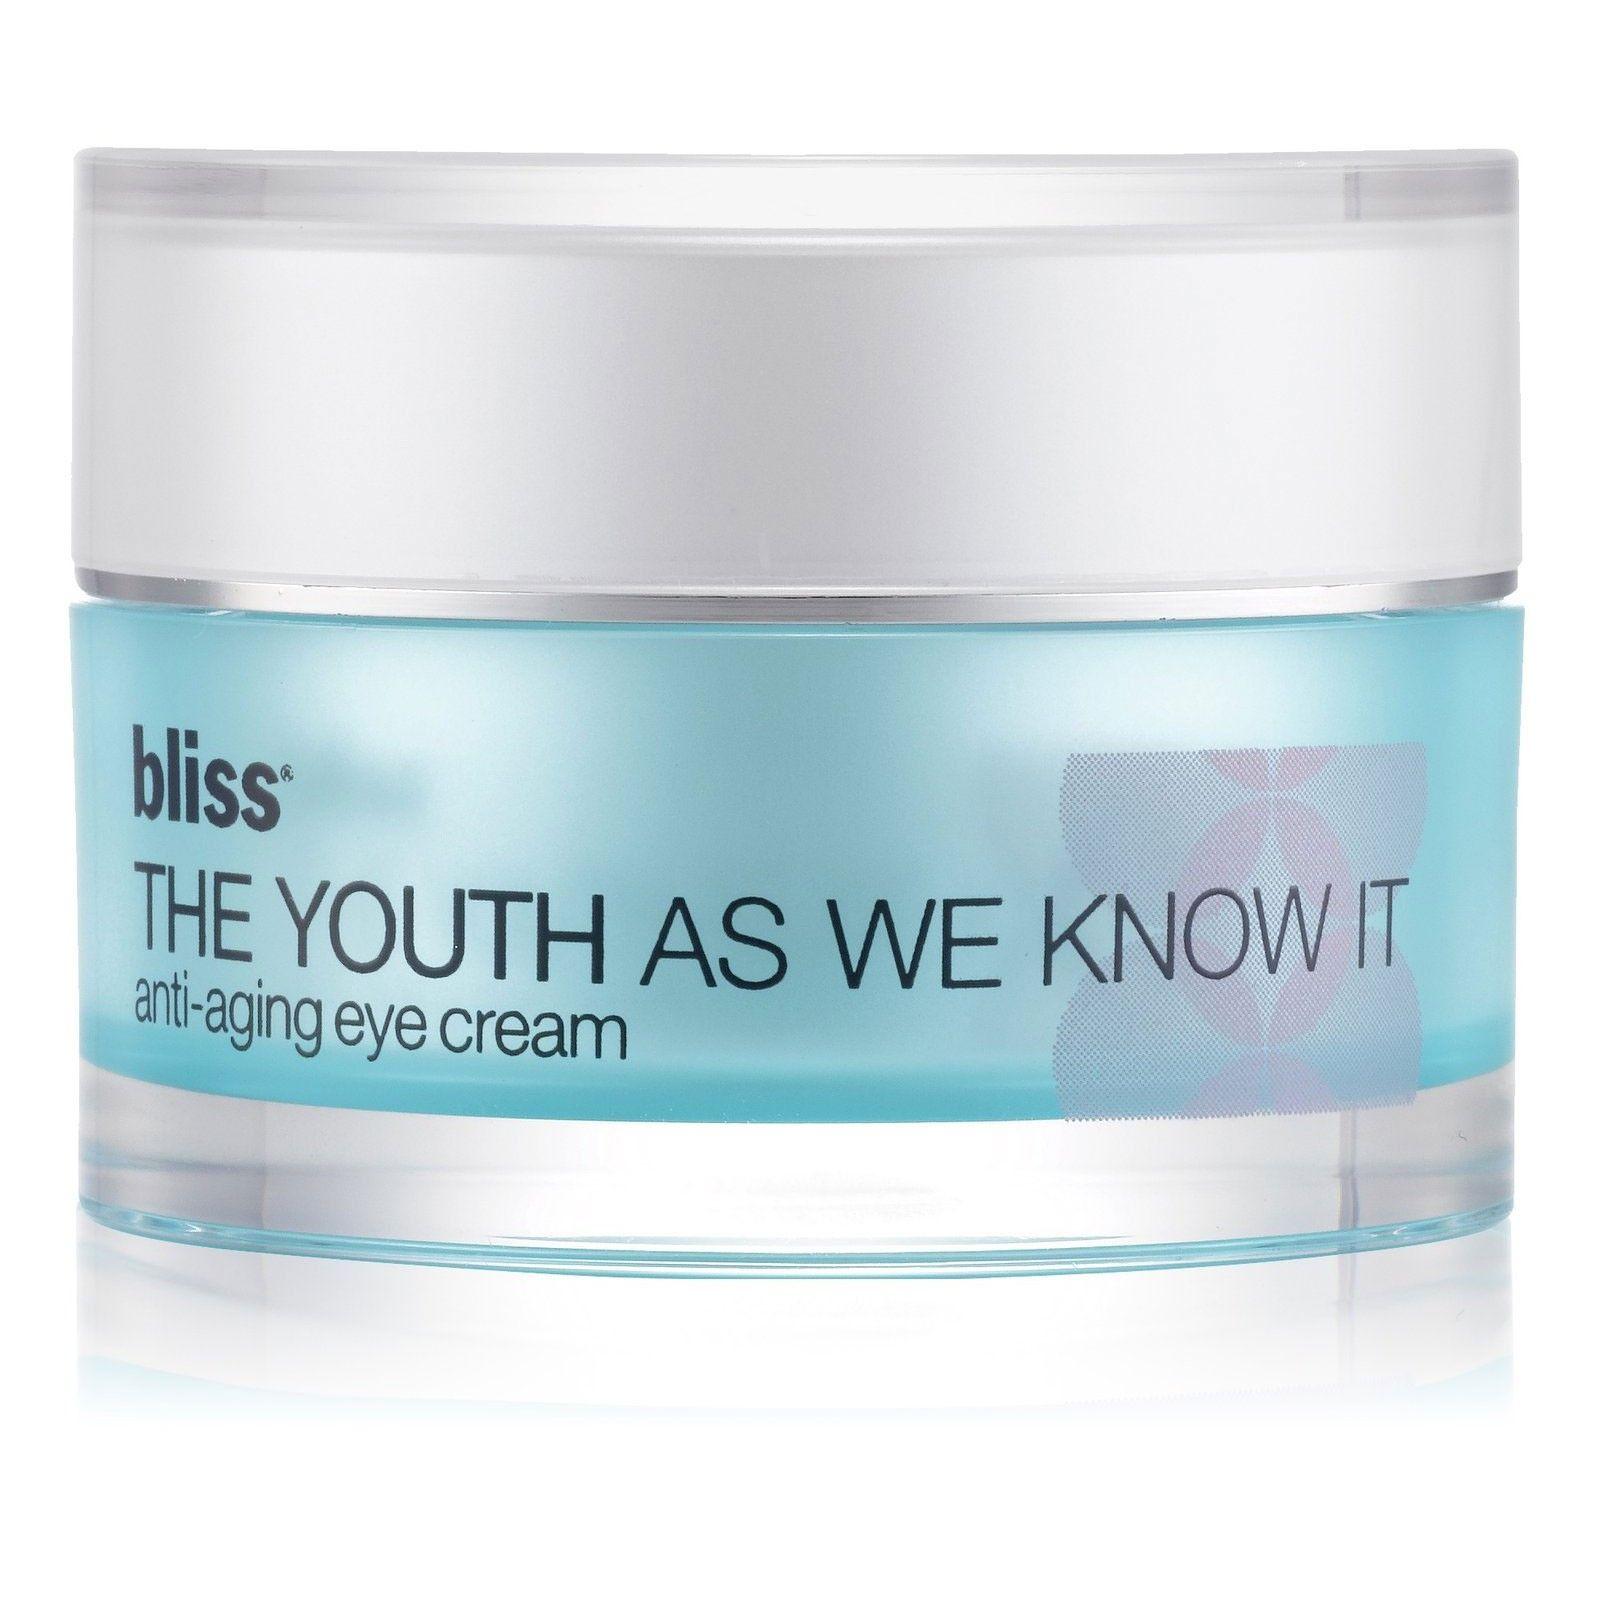 Wwwrickysnyccom Bliss The Youth As We Know It AntiAging Eye Cream